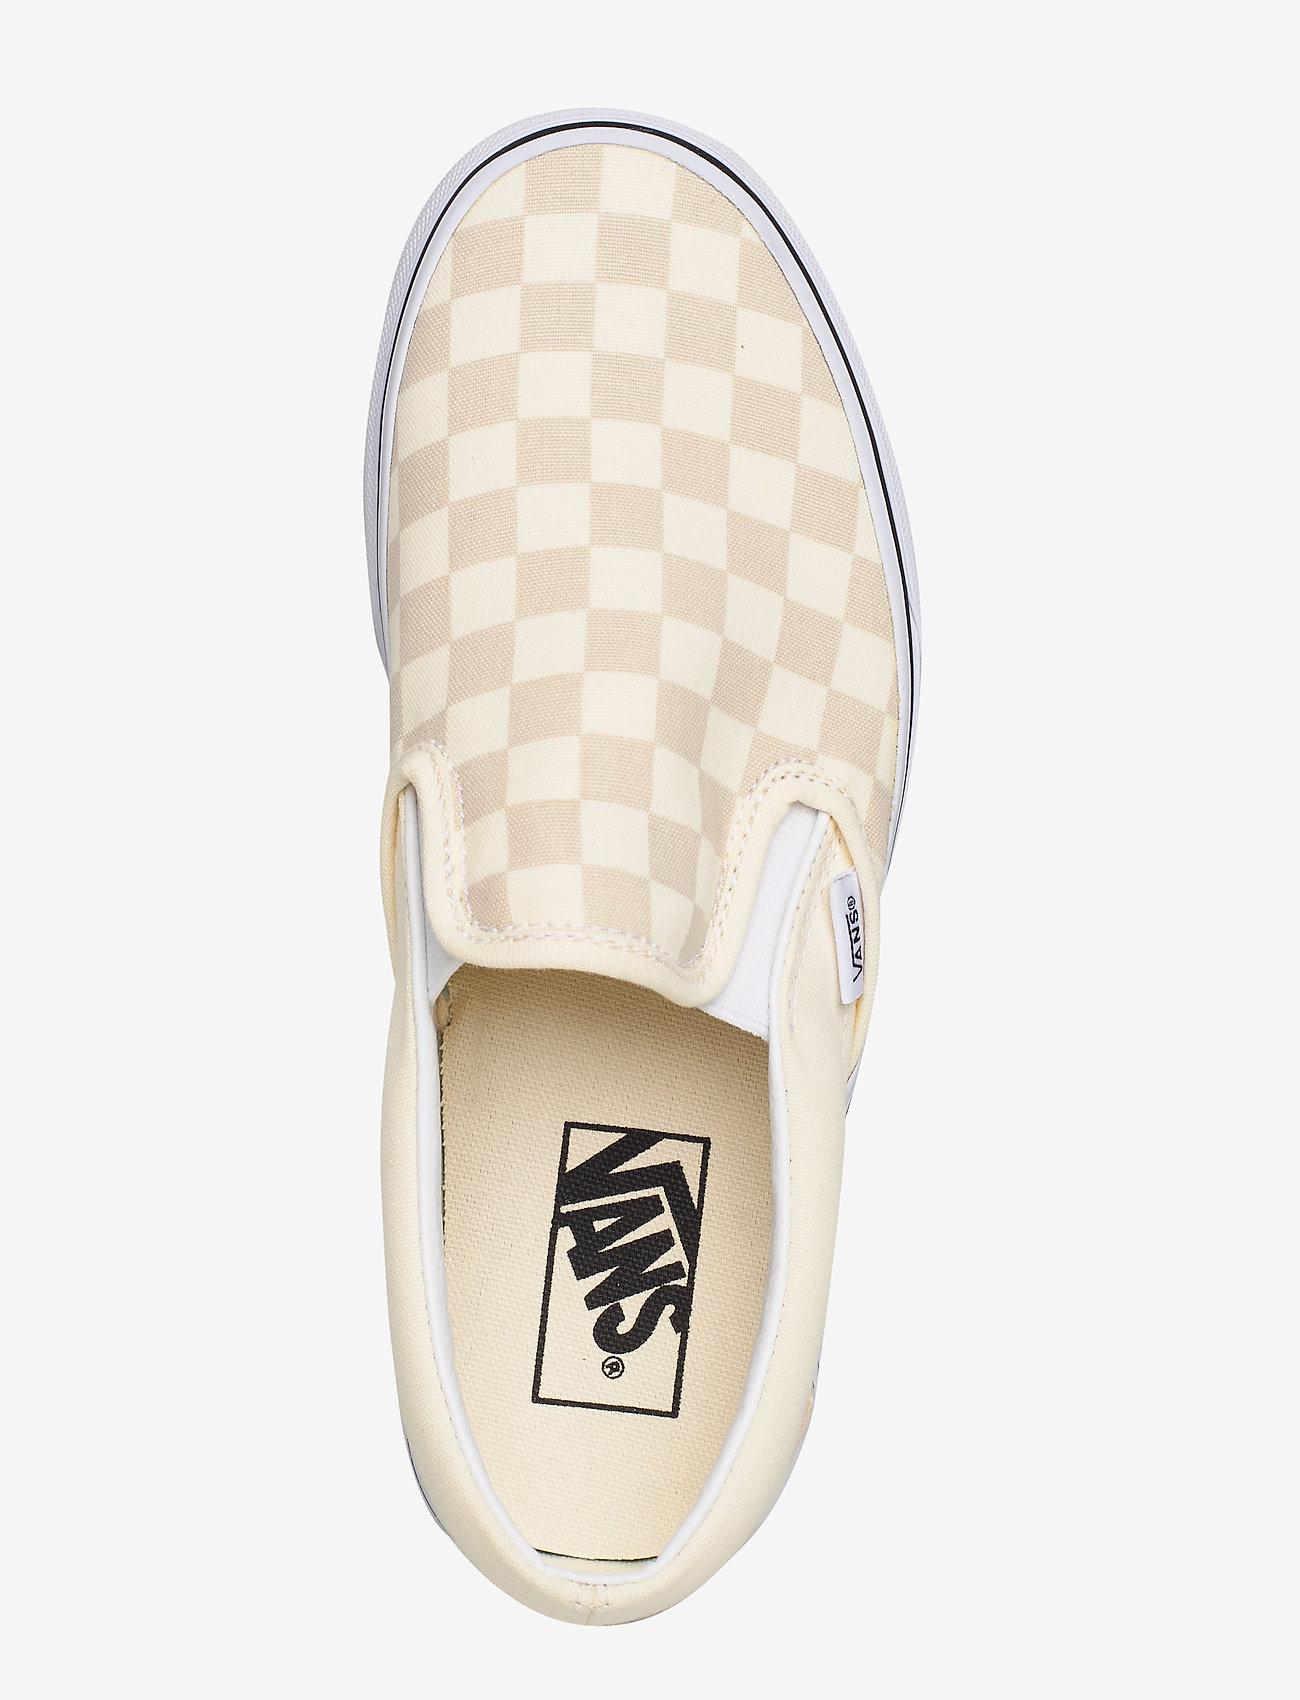 Ua Classic Slip-on ((checkerboard)clscwhttrwt) (449.25 kr) - VANS